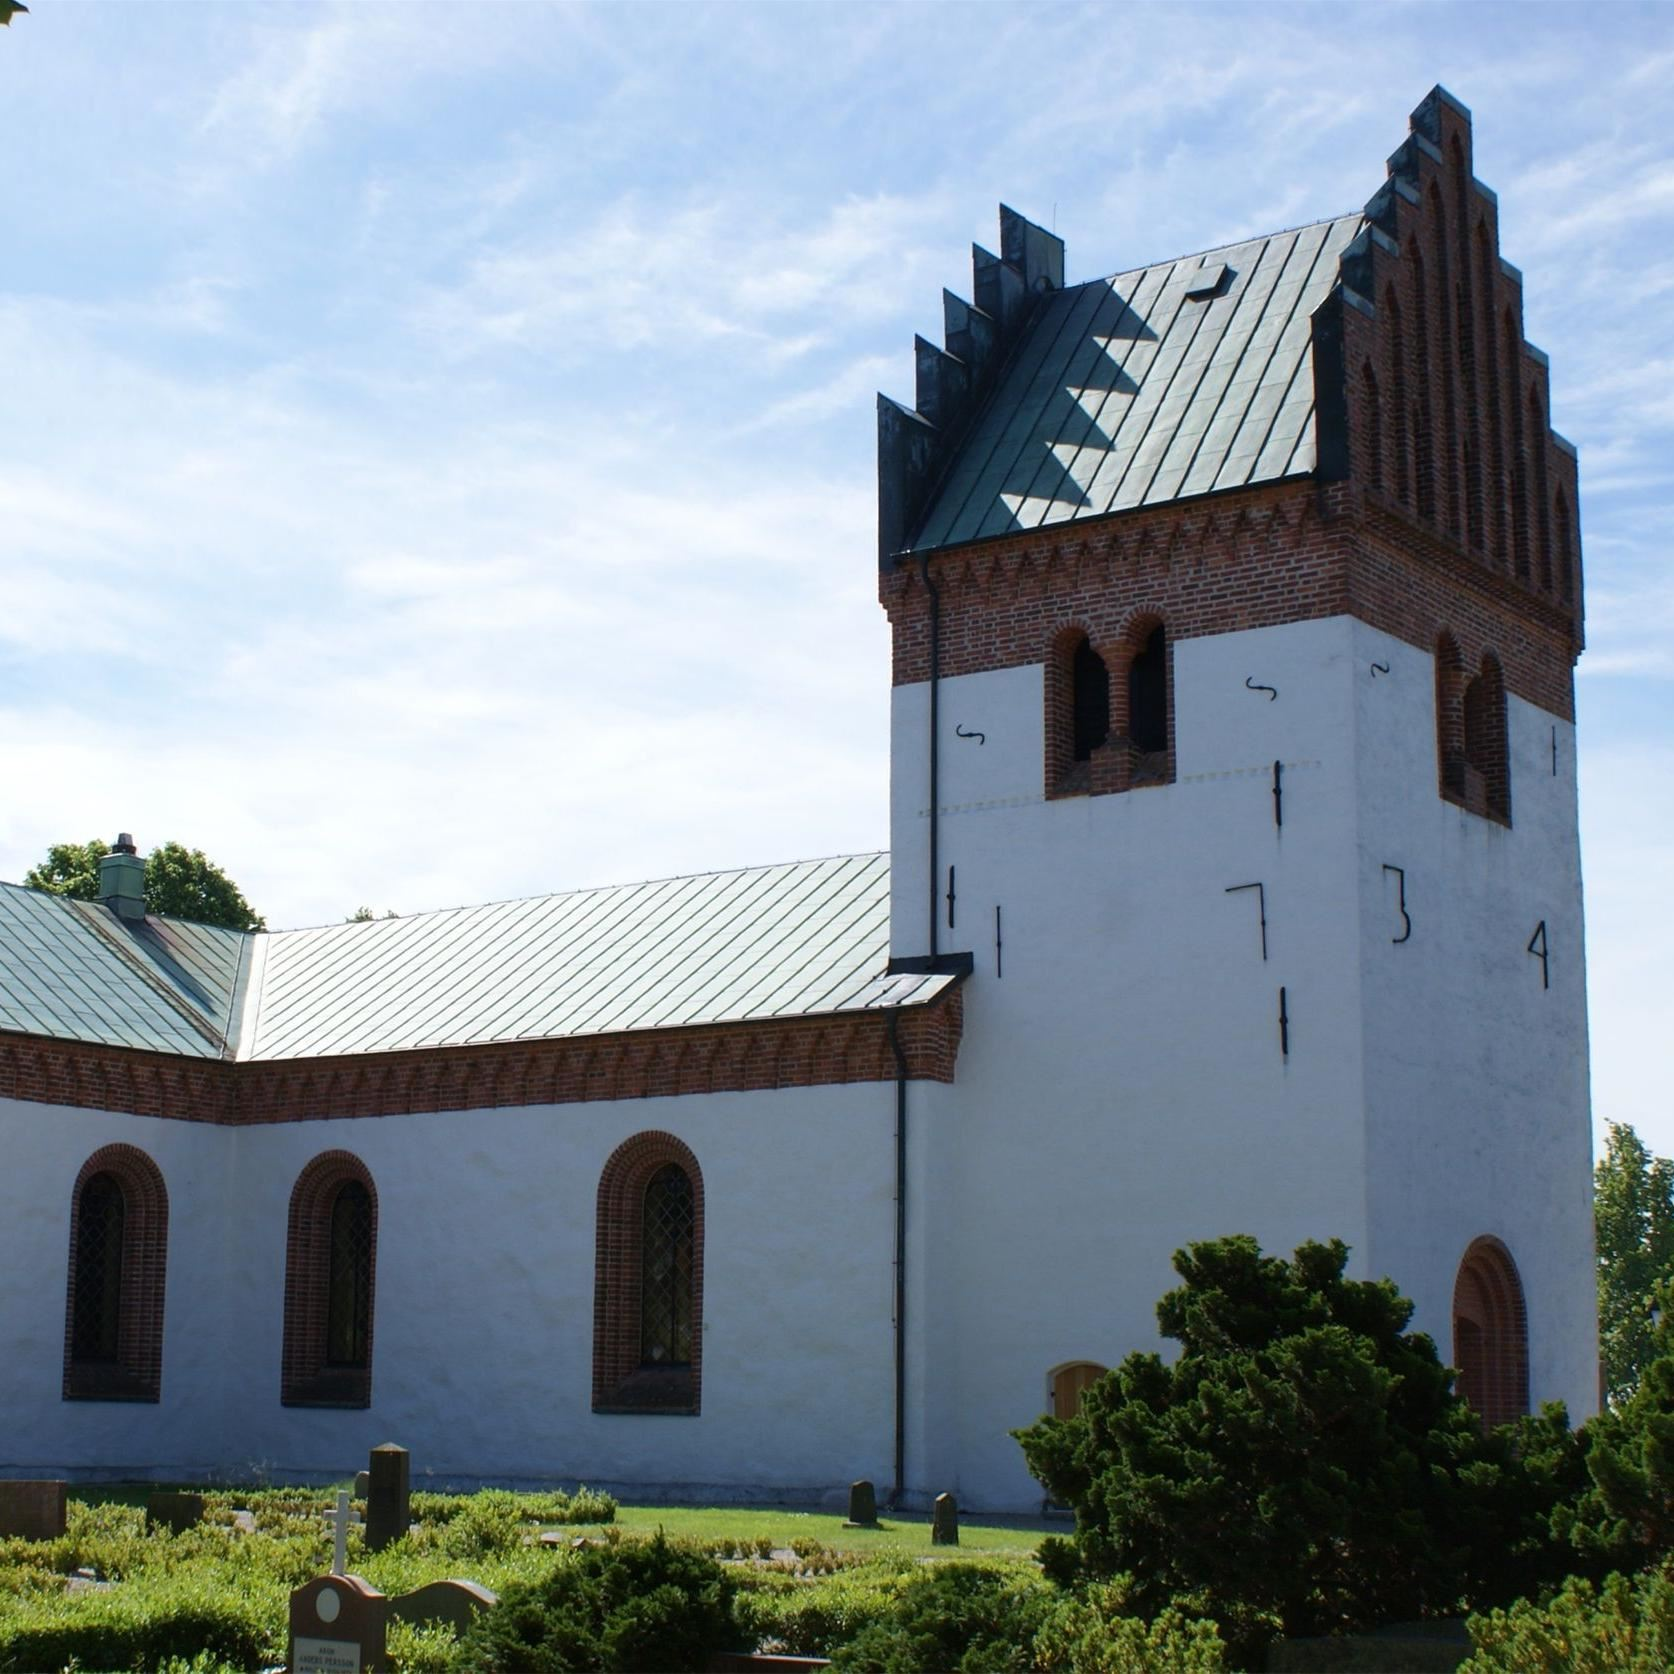 © Kävlinge församling, Stora Harrie Kirche